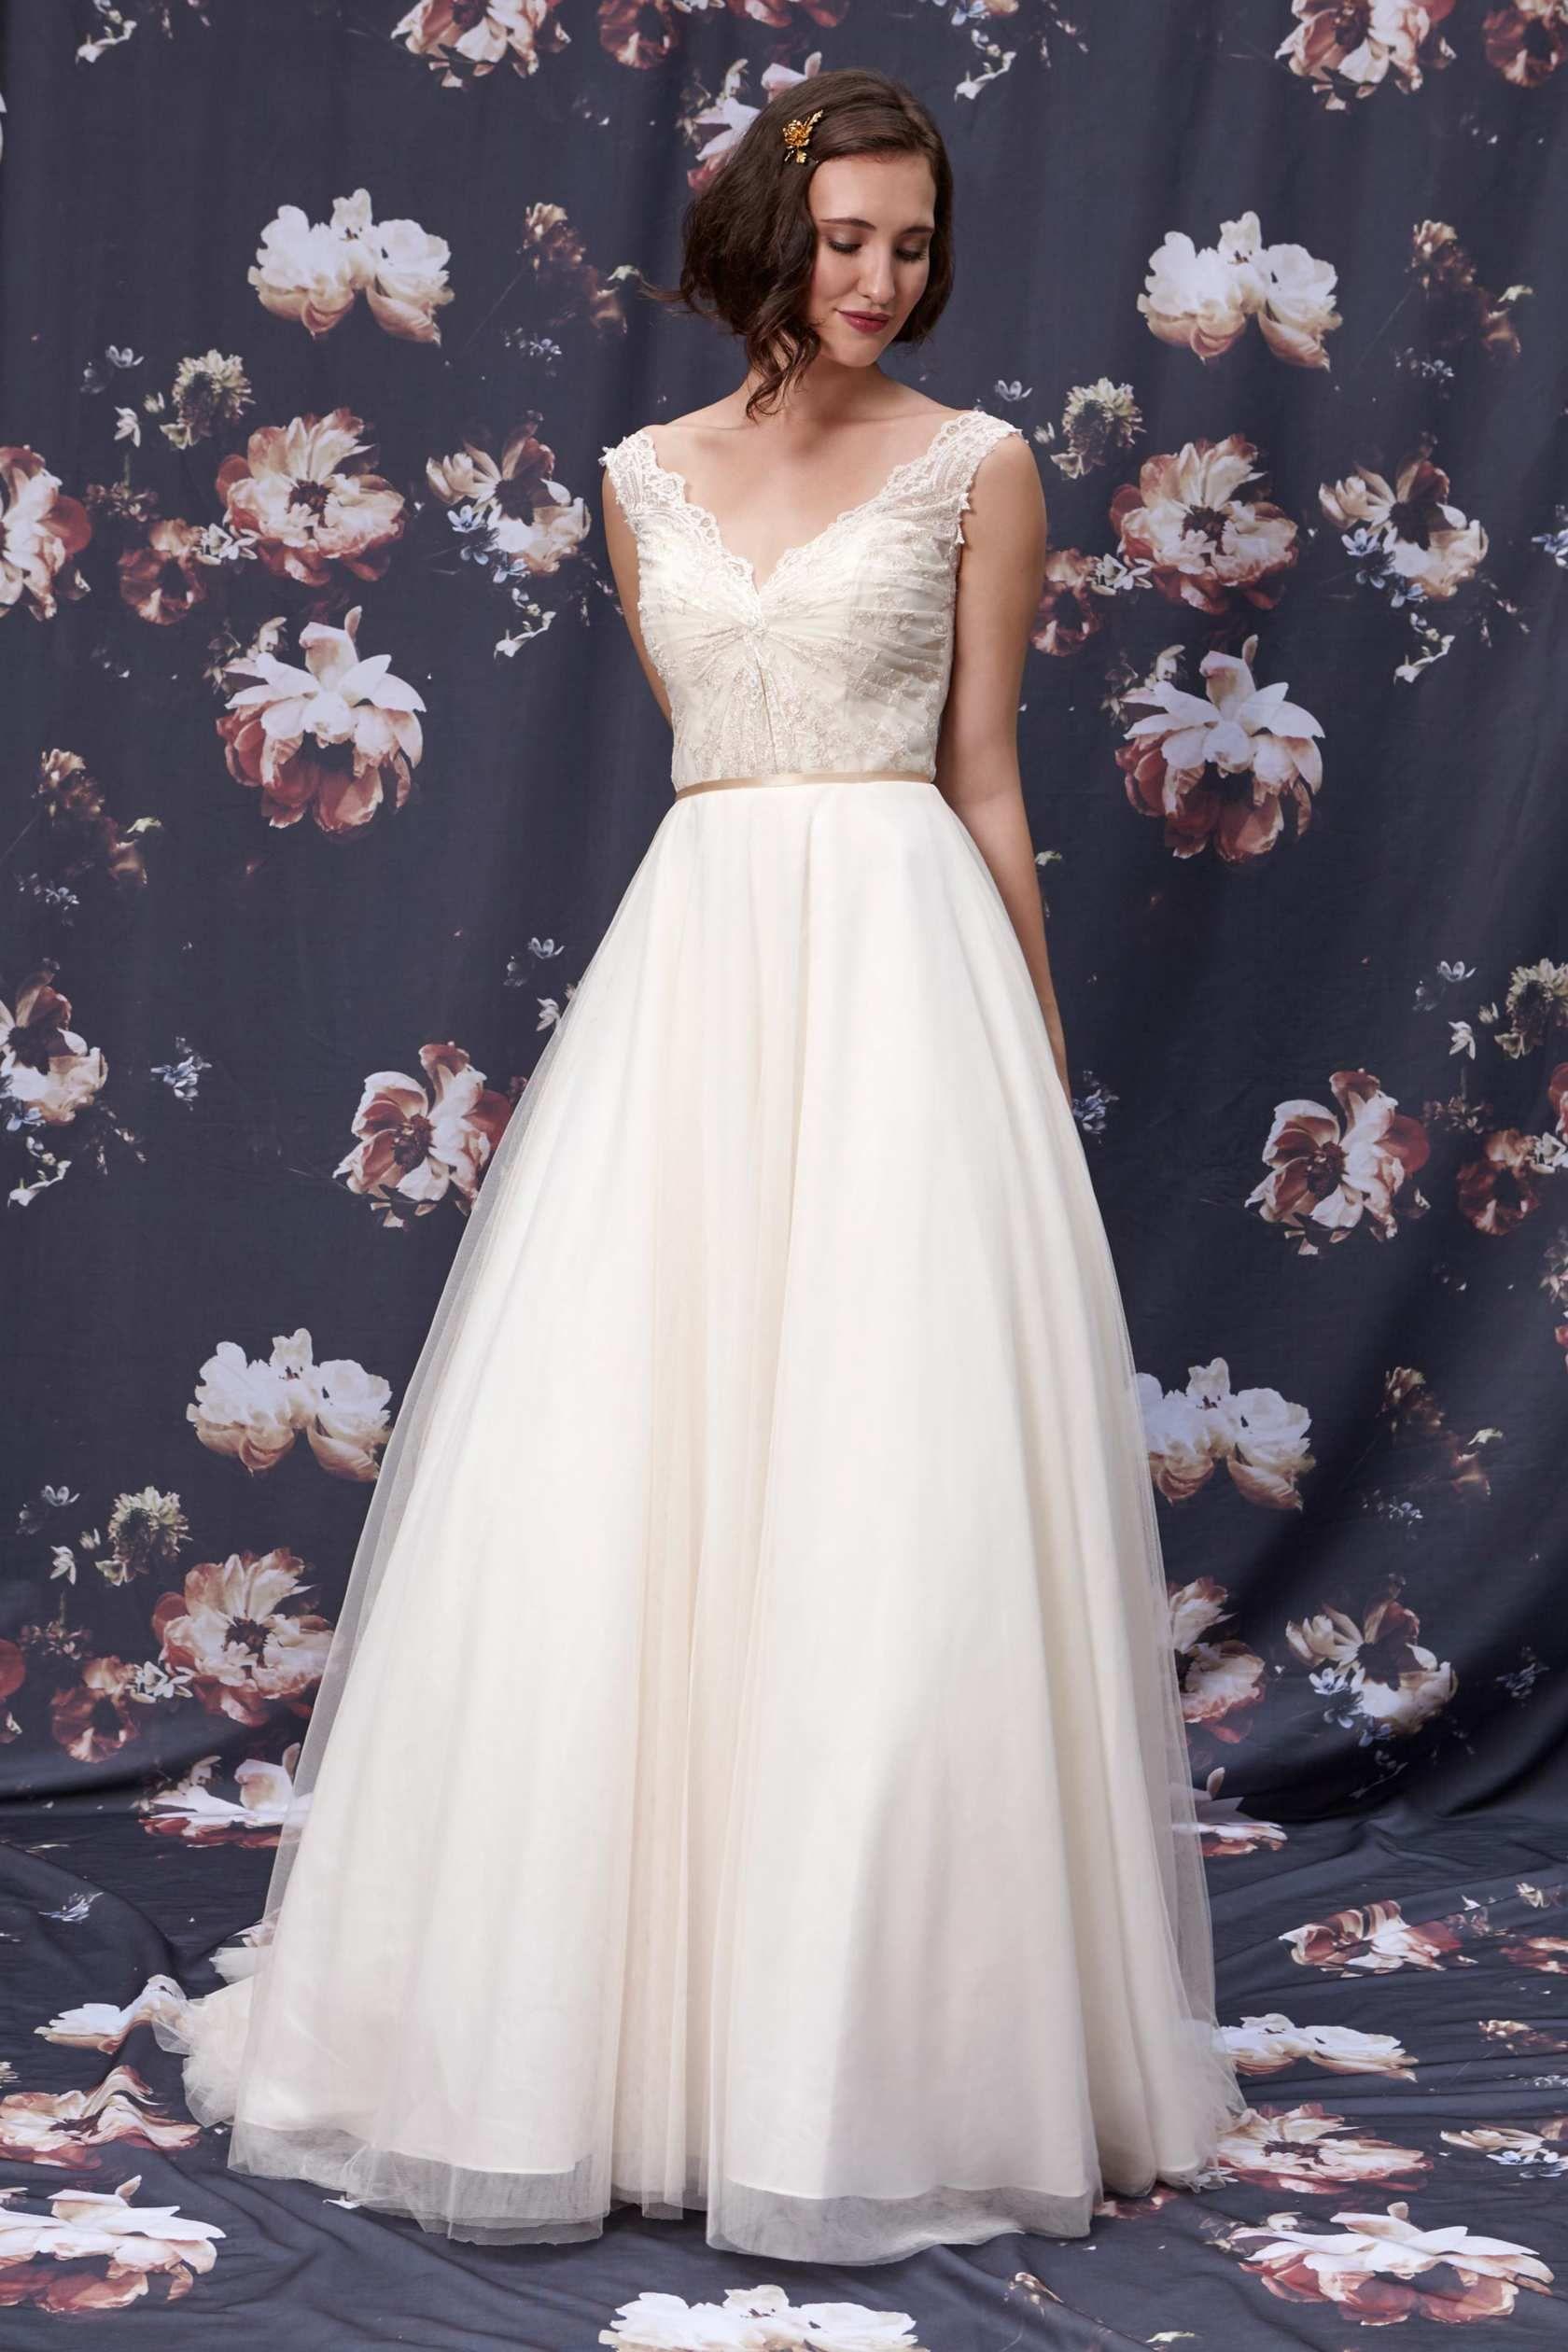 Ivy & Aster Wedding dresses, Wedding gowns, Bridal